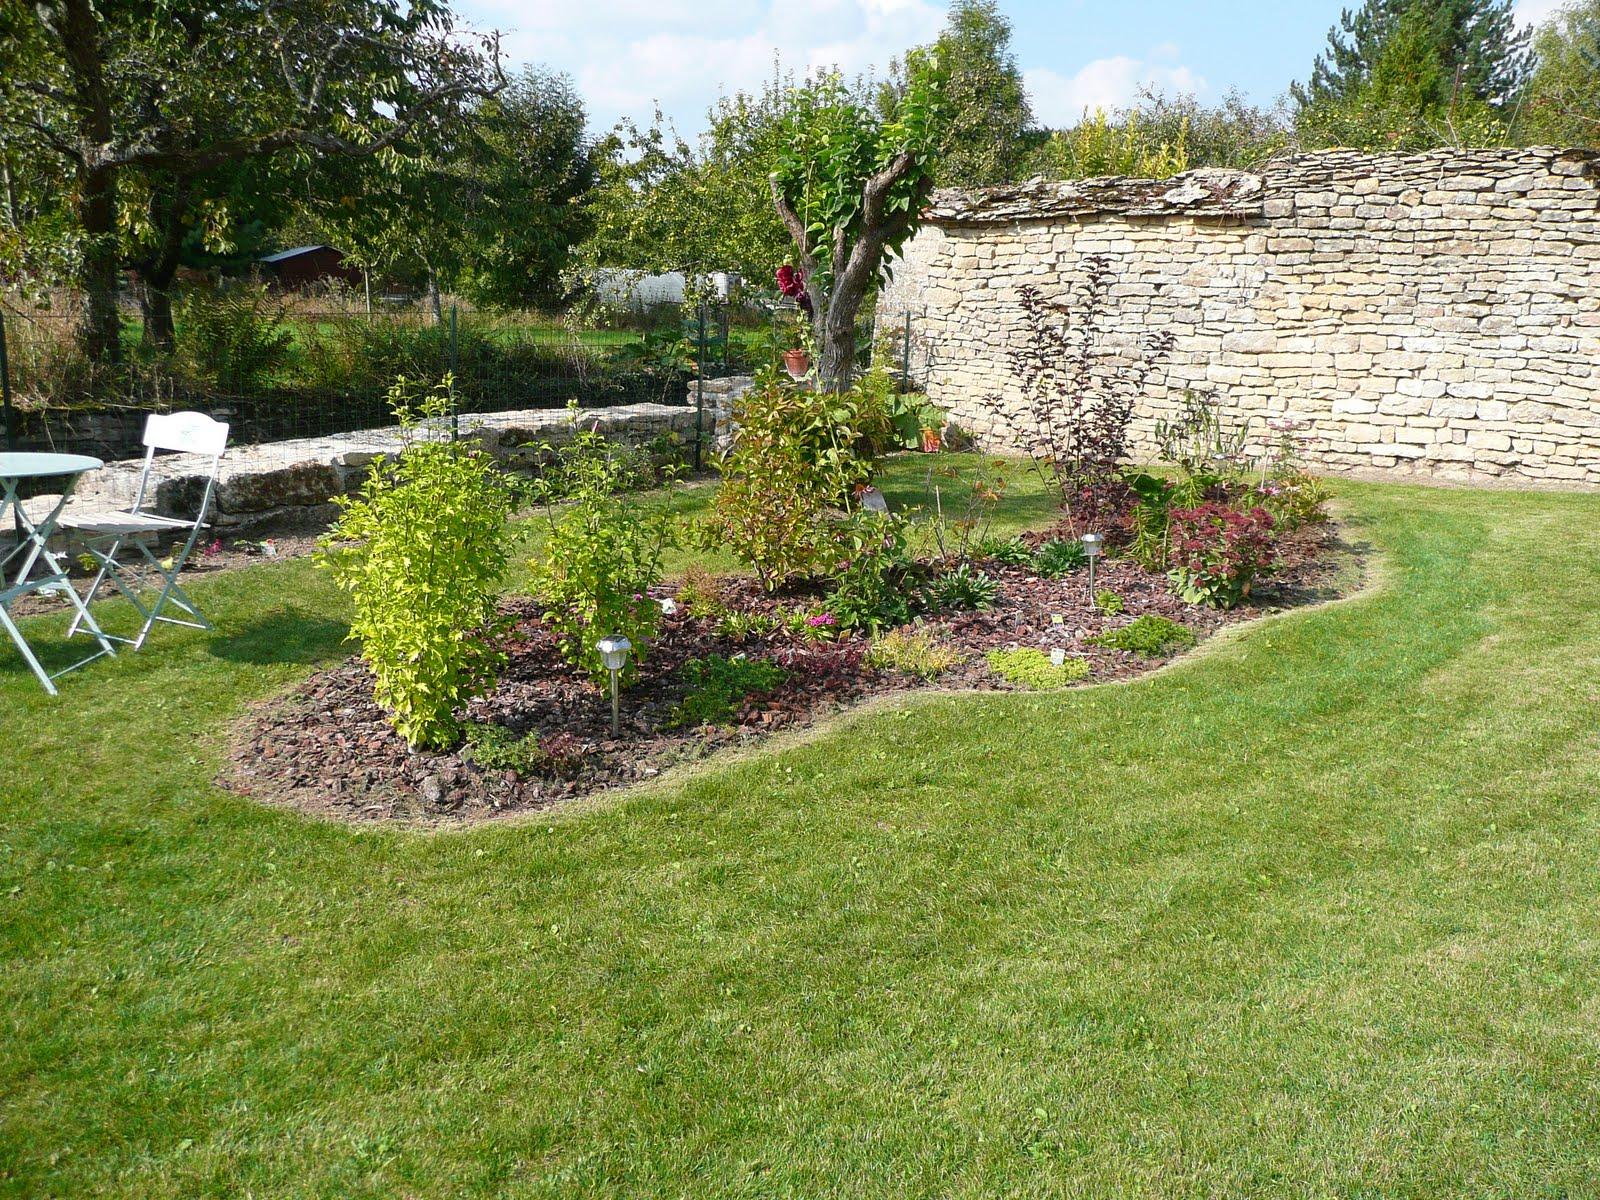 Notre jardin secret massif haricot evolution for Massif decoratif jardin